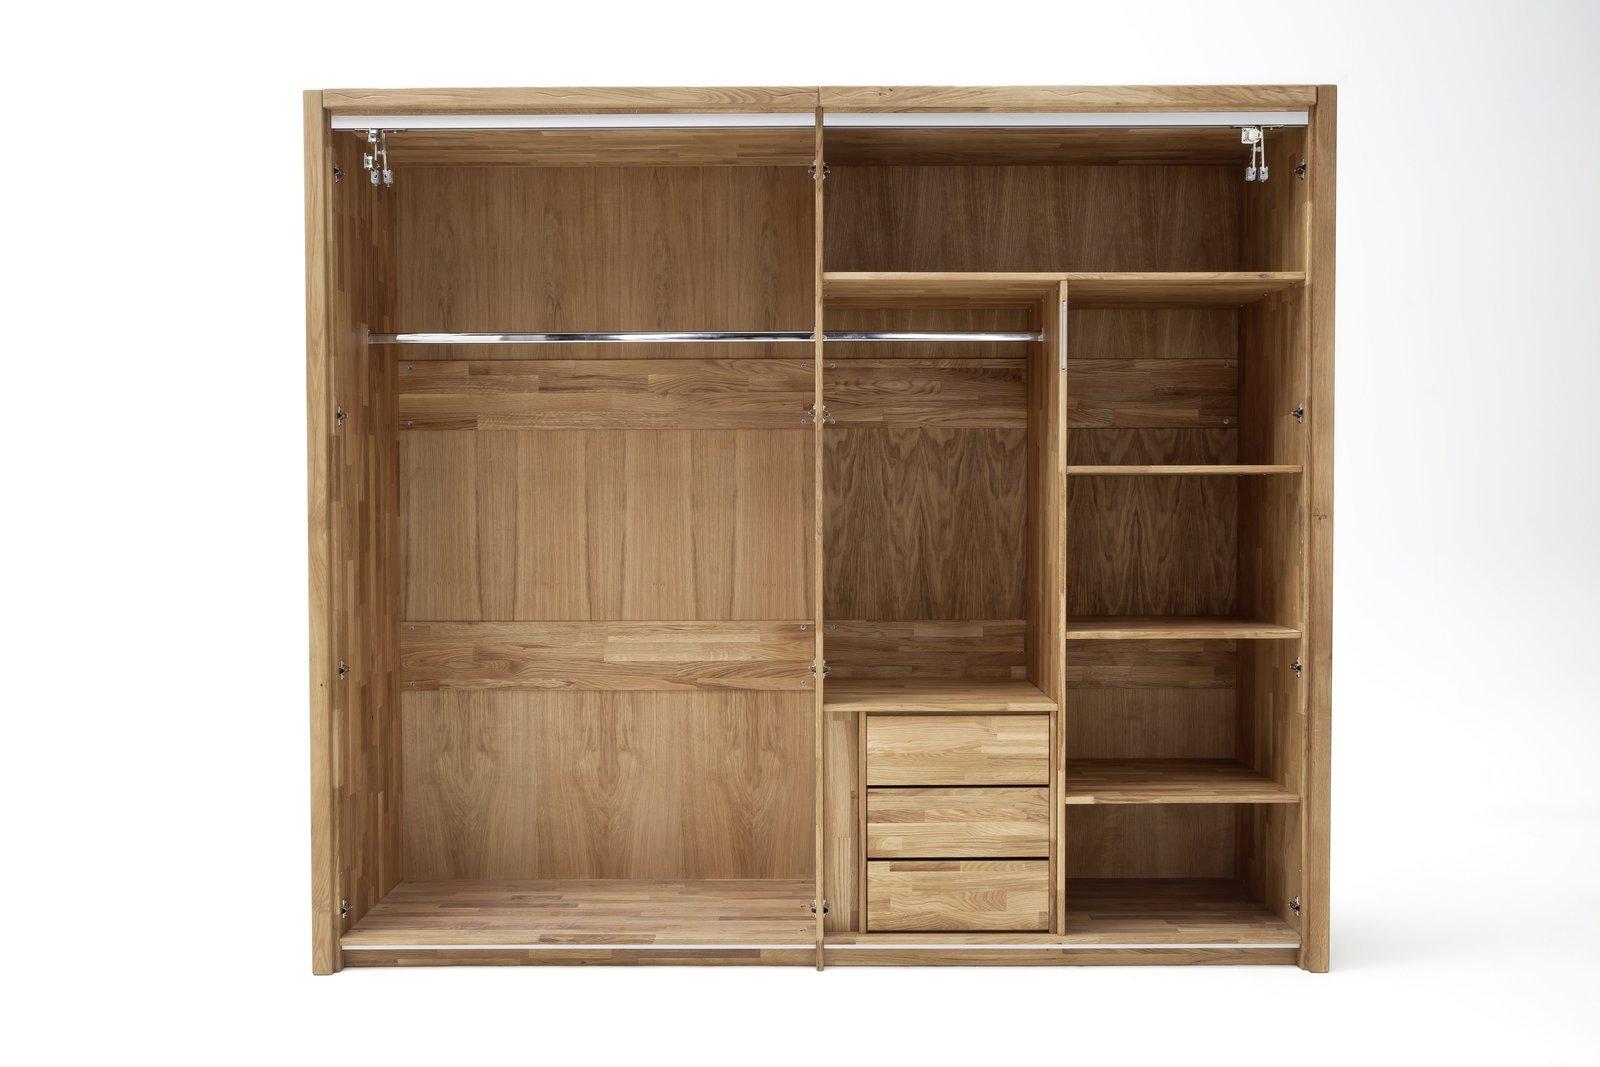 Massivholz Schlafzimmer Ditte, Bild 3